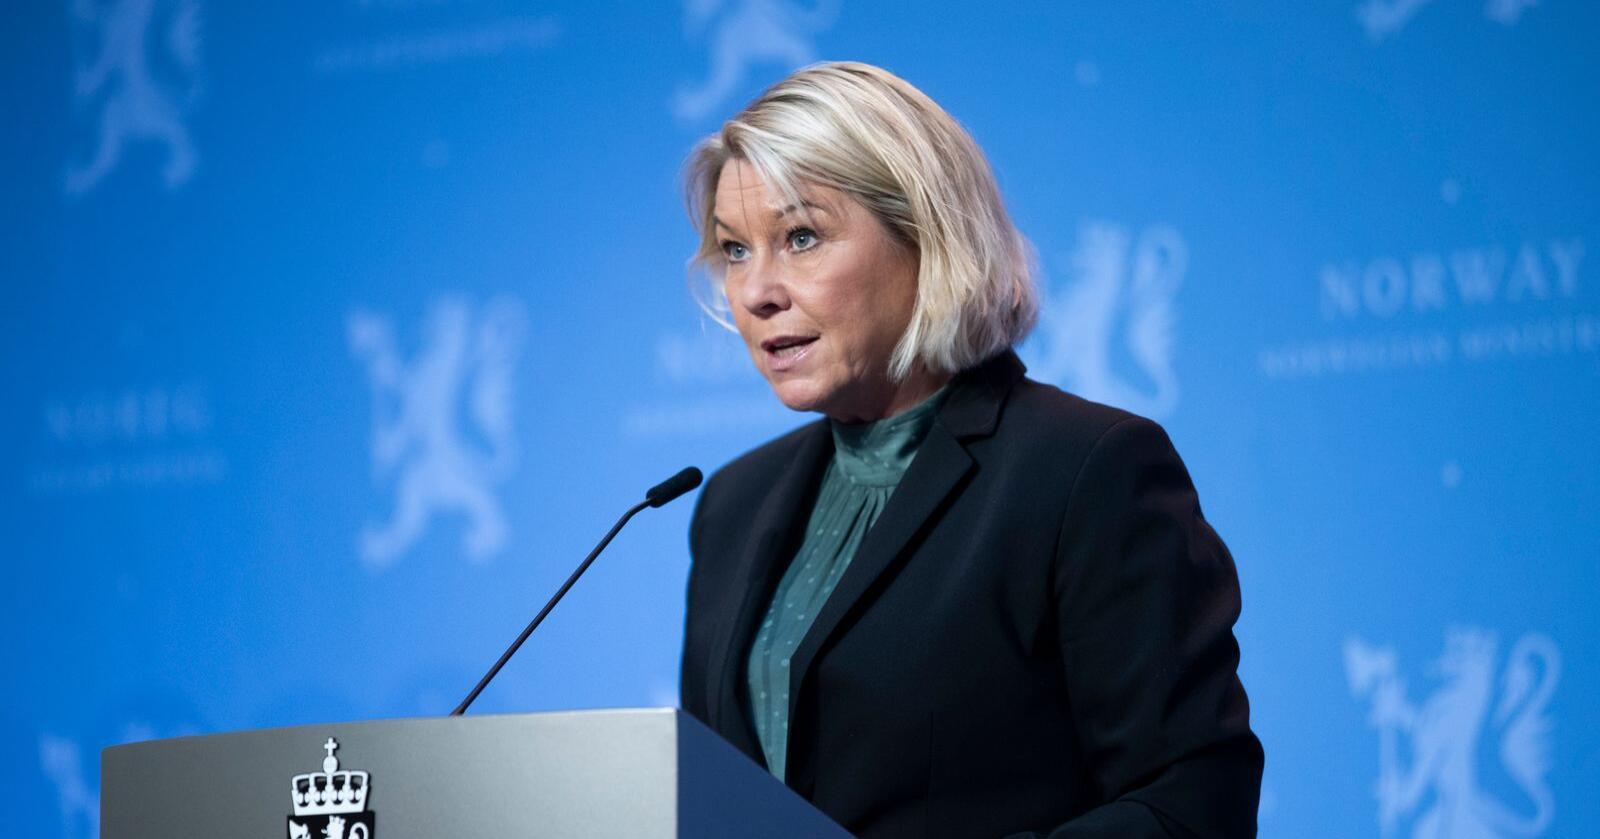 Justis- og beredskapsminister Monica Mæland (H) foreslår en lov om portforbud.  Det vil hindre bevegelsesfriheten og privatlivet på en måte som ikke ligner Norge.  Foto: Berit Roald / NTB